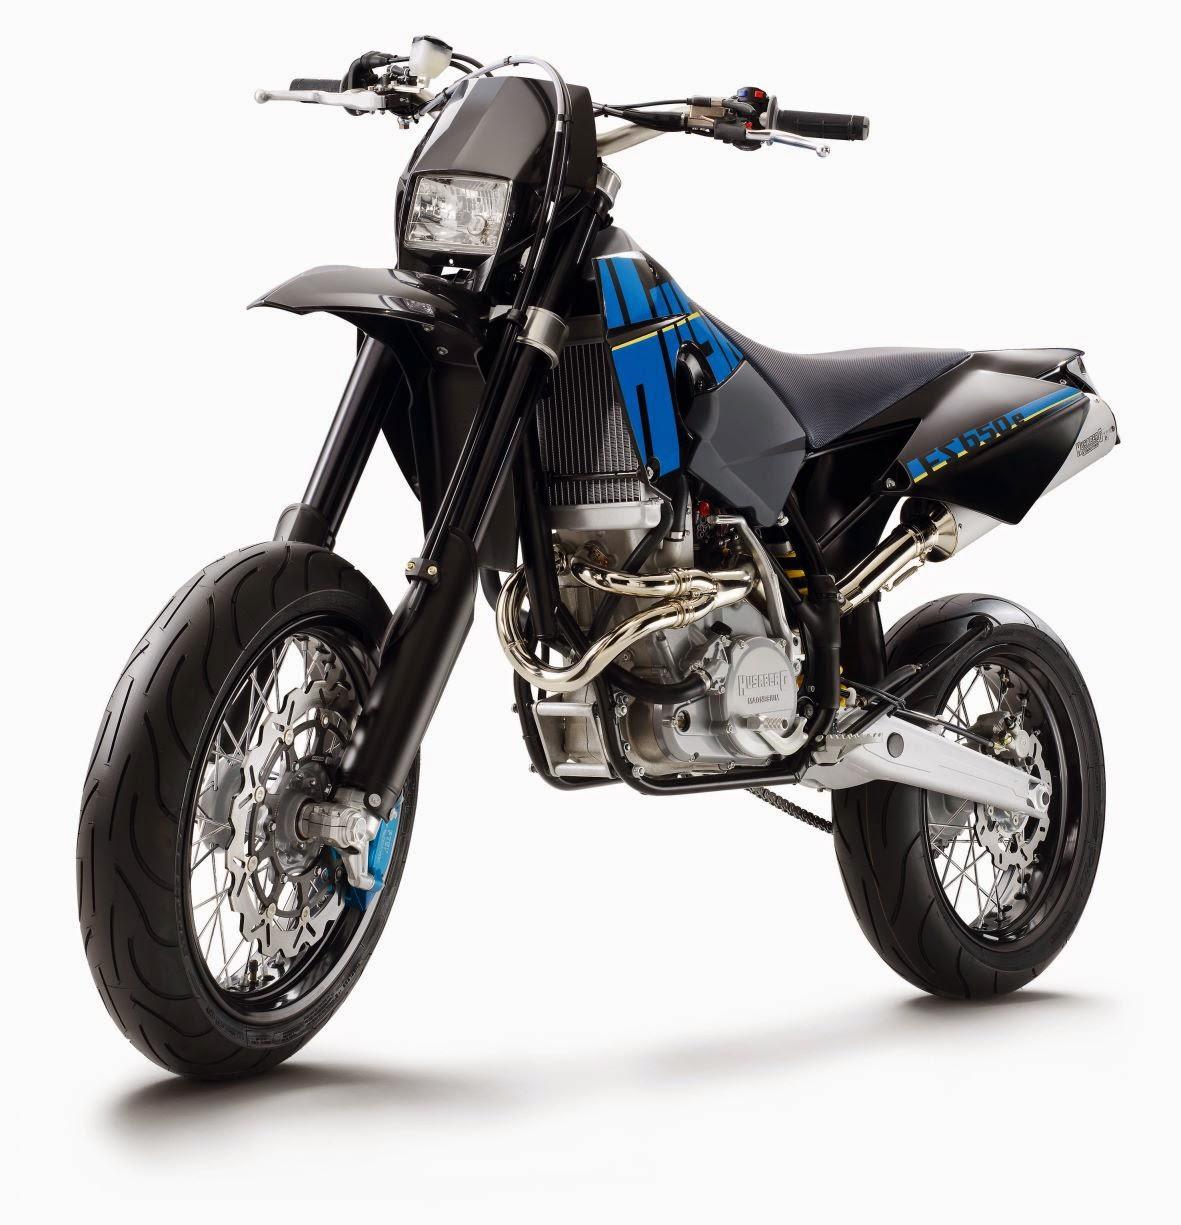 Husaberg FE 650 E Dirt Bikes